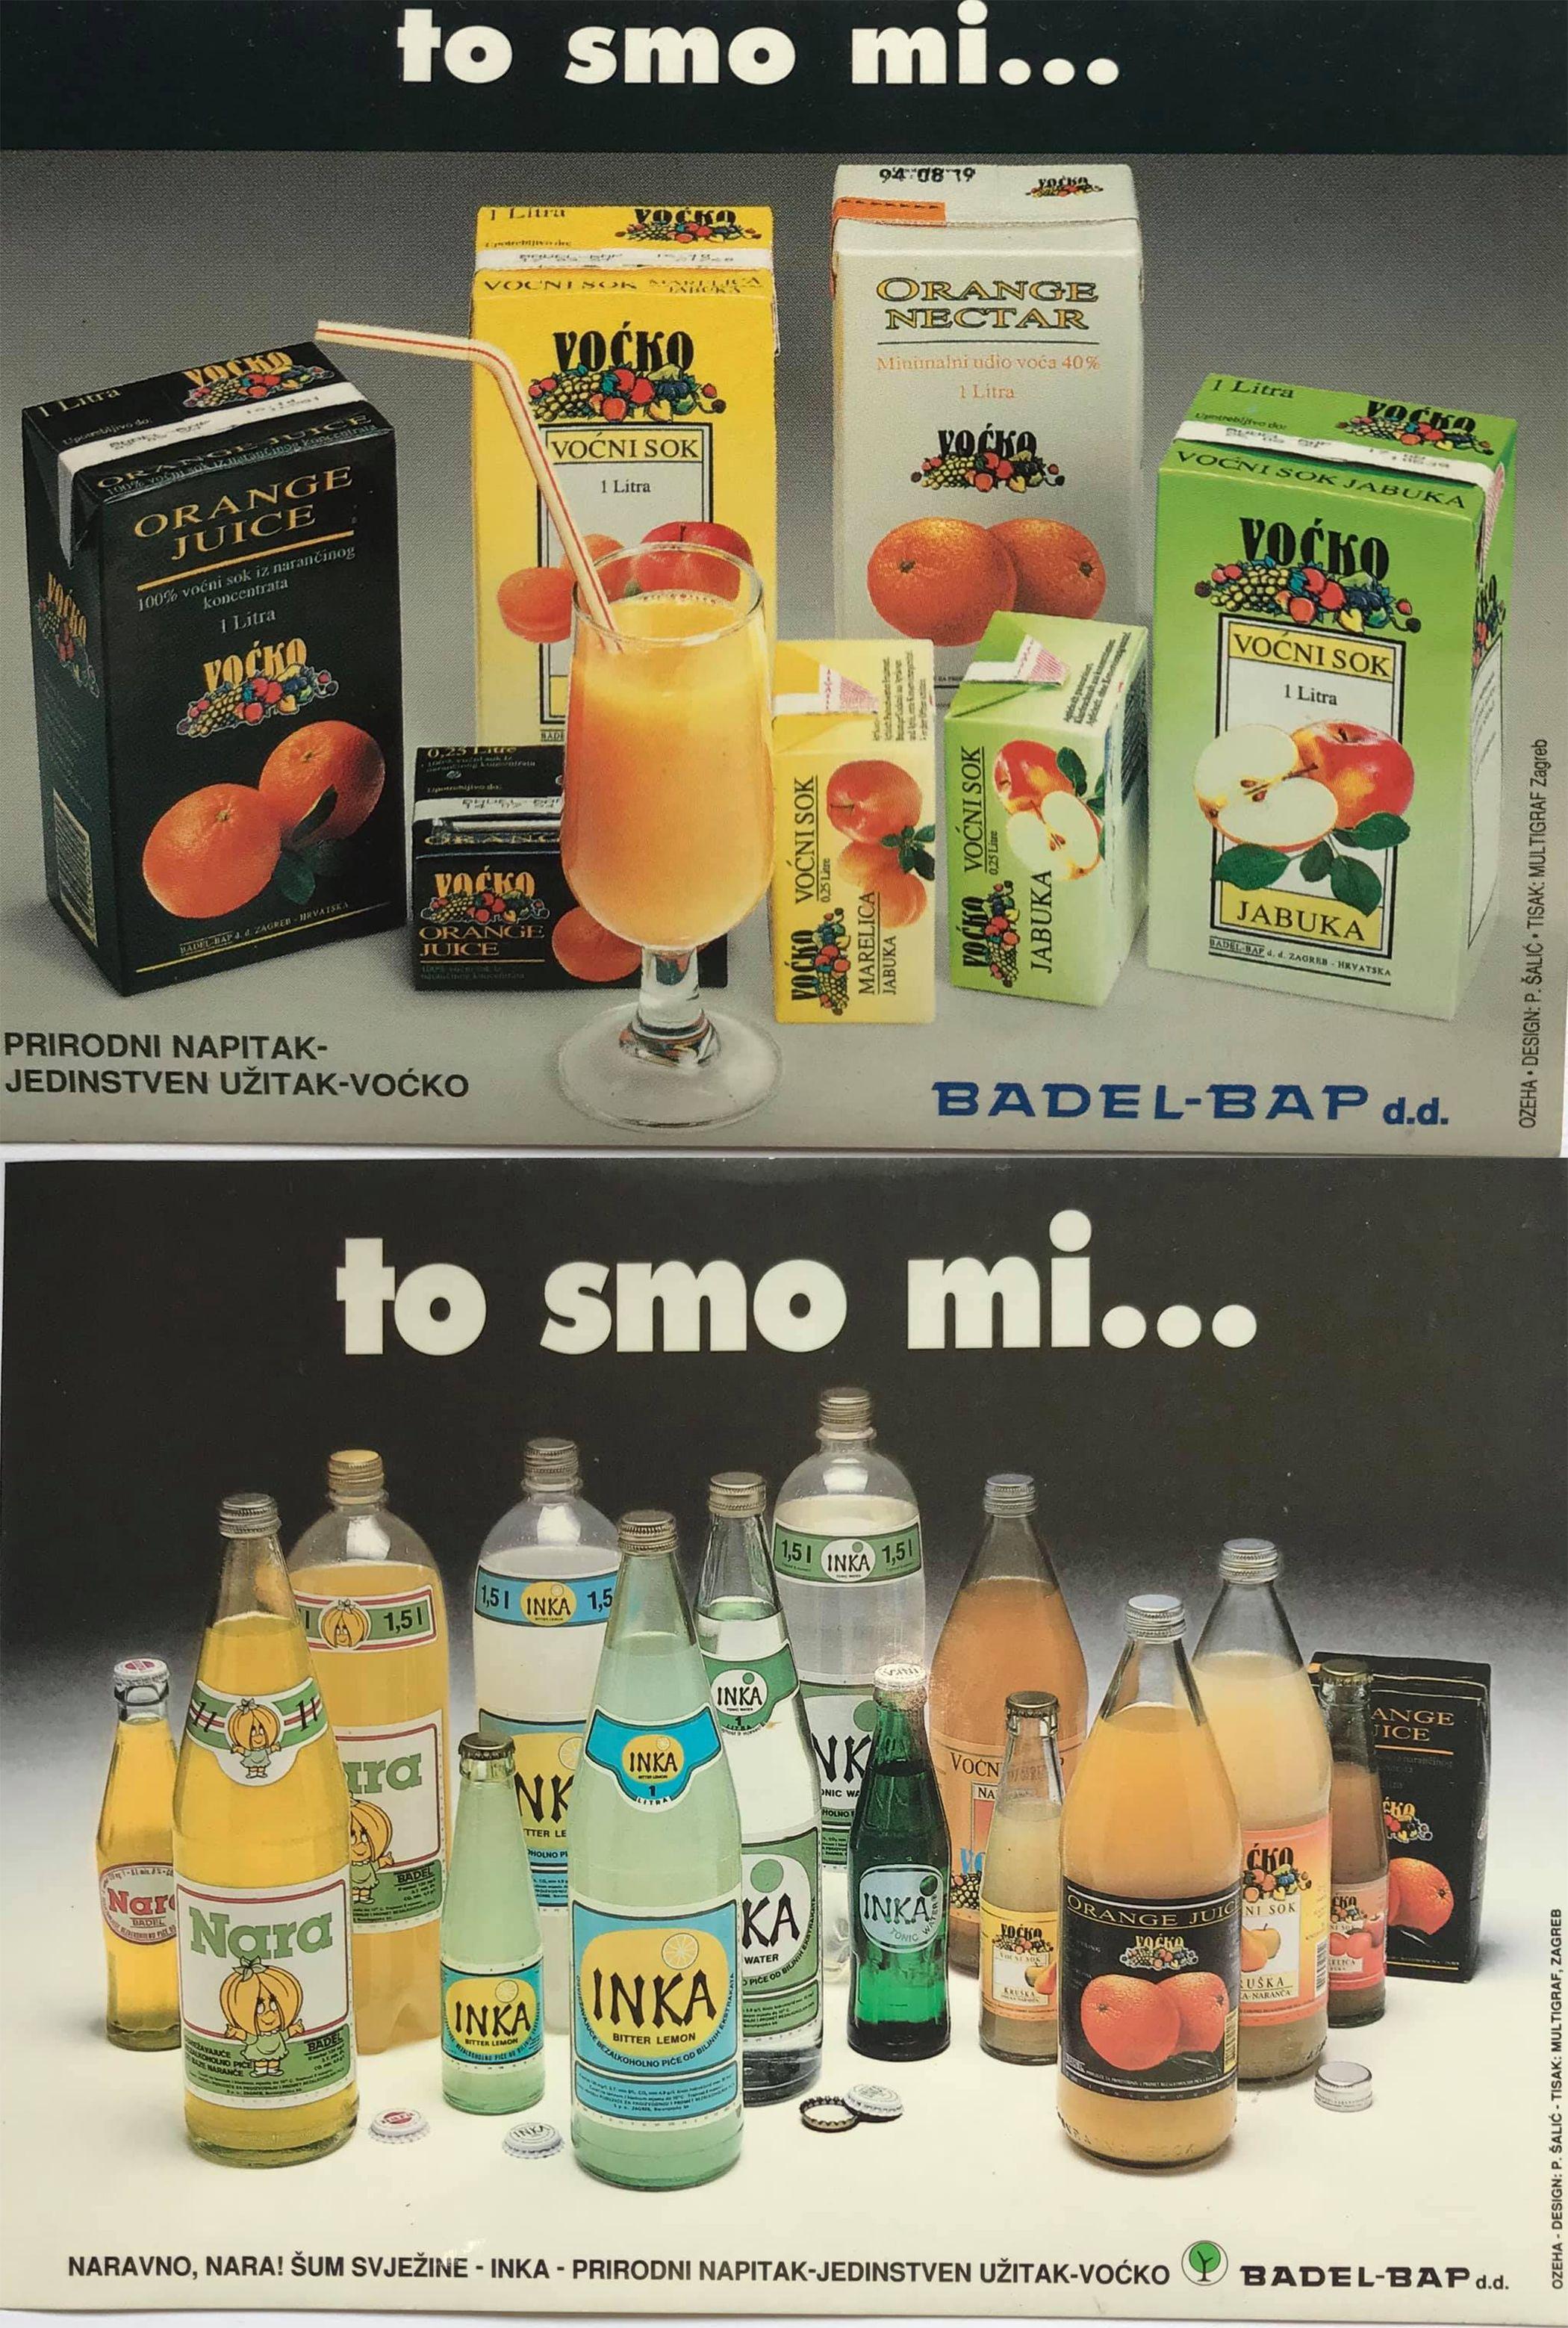 Famous Designers Of Ozeha Petar Salic For Badel Advertising Material Packaging Design Design